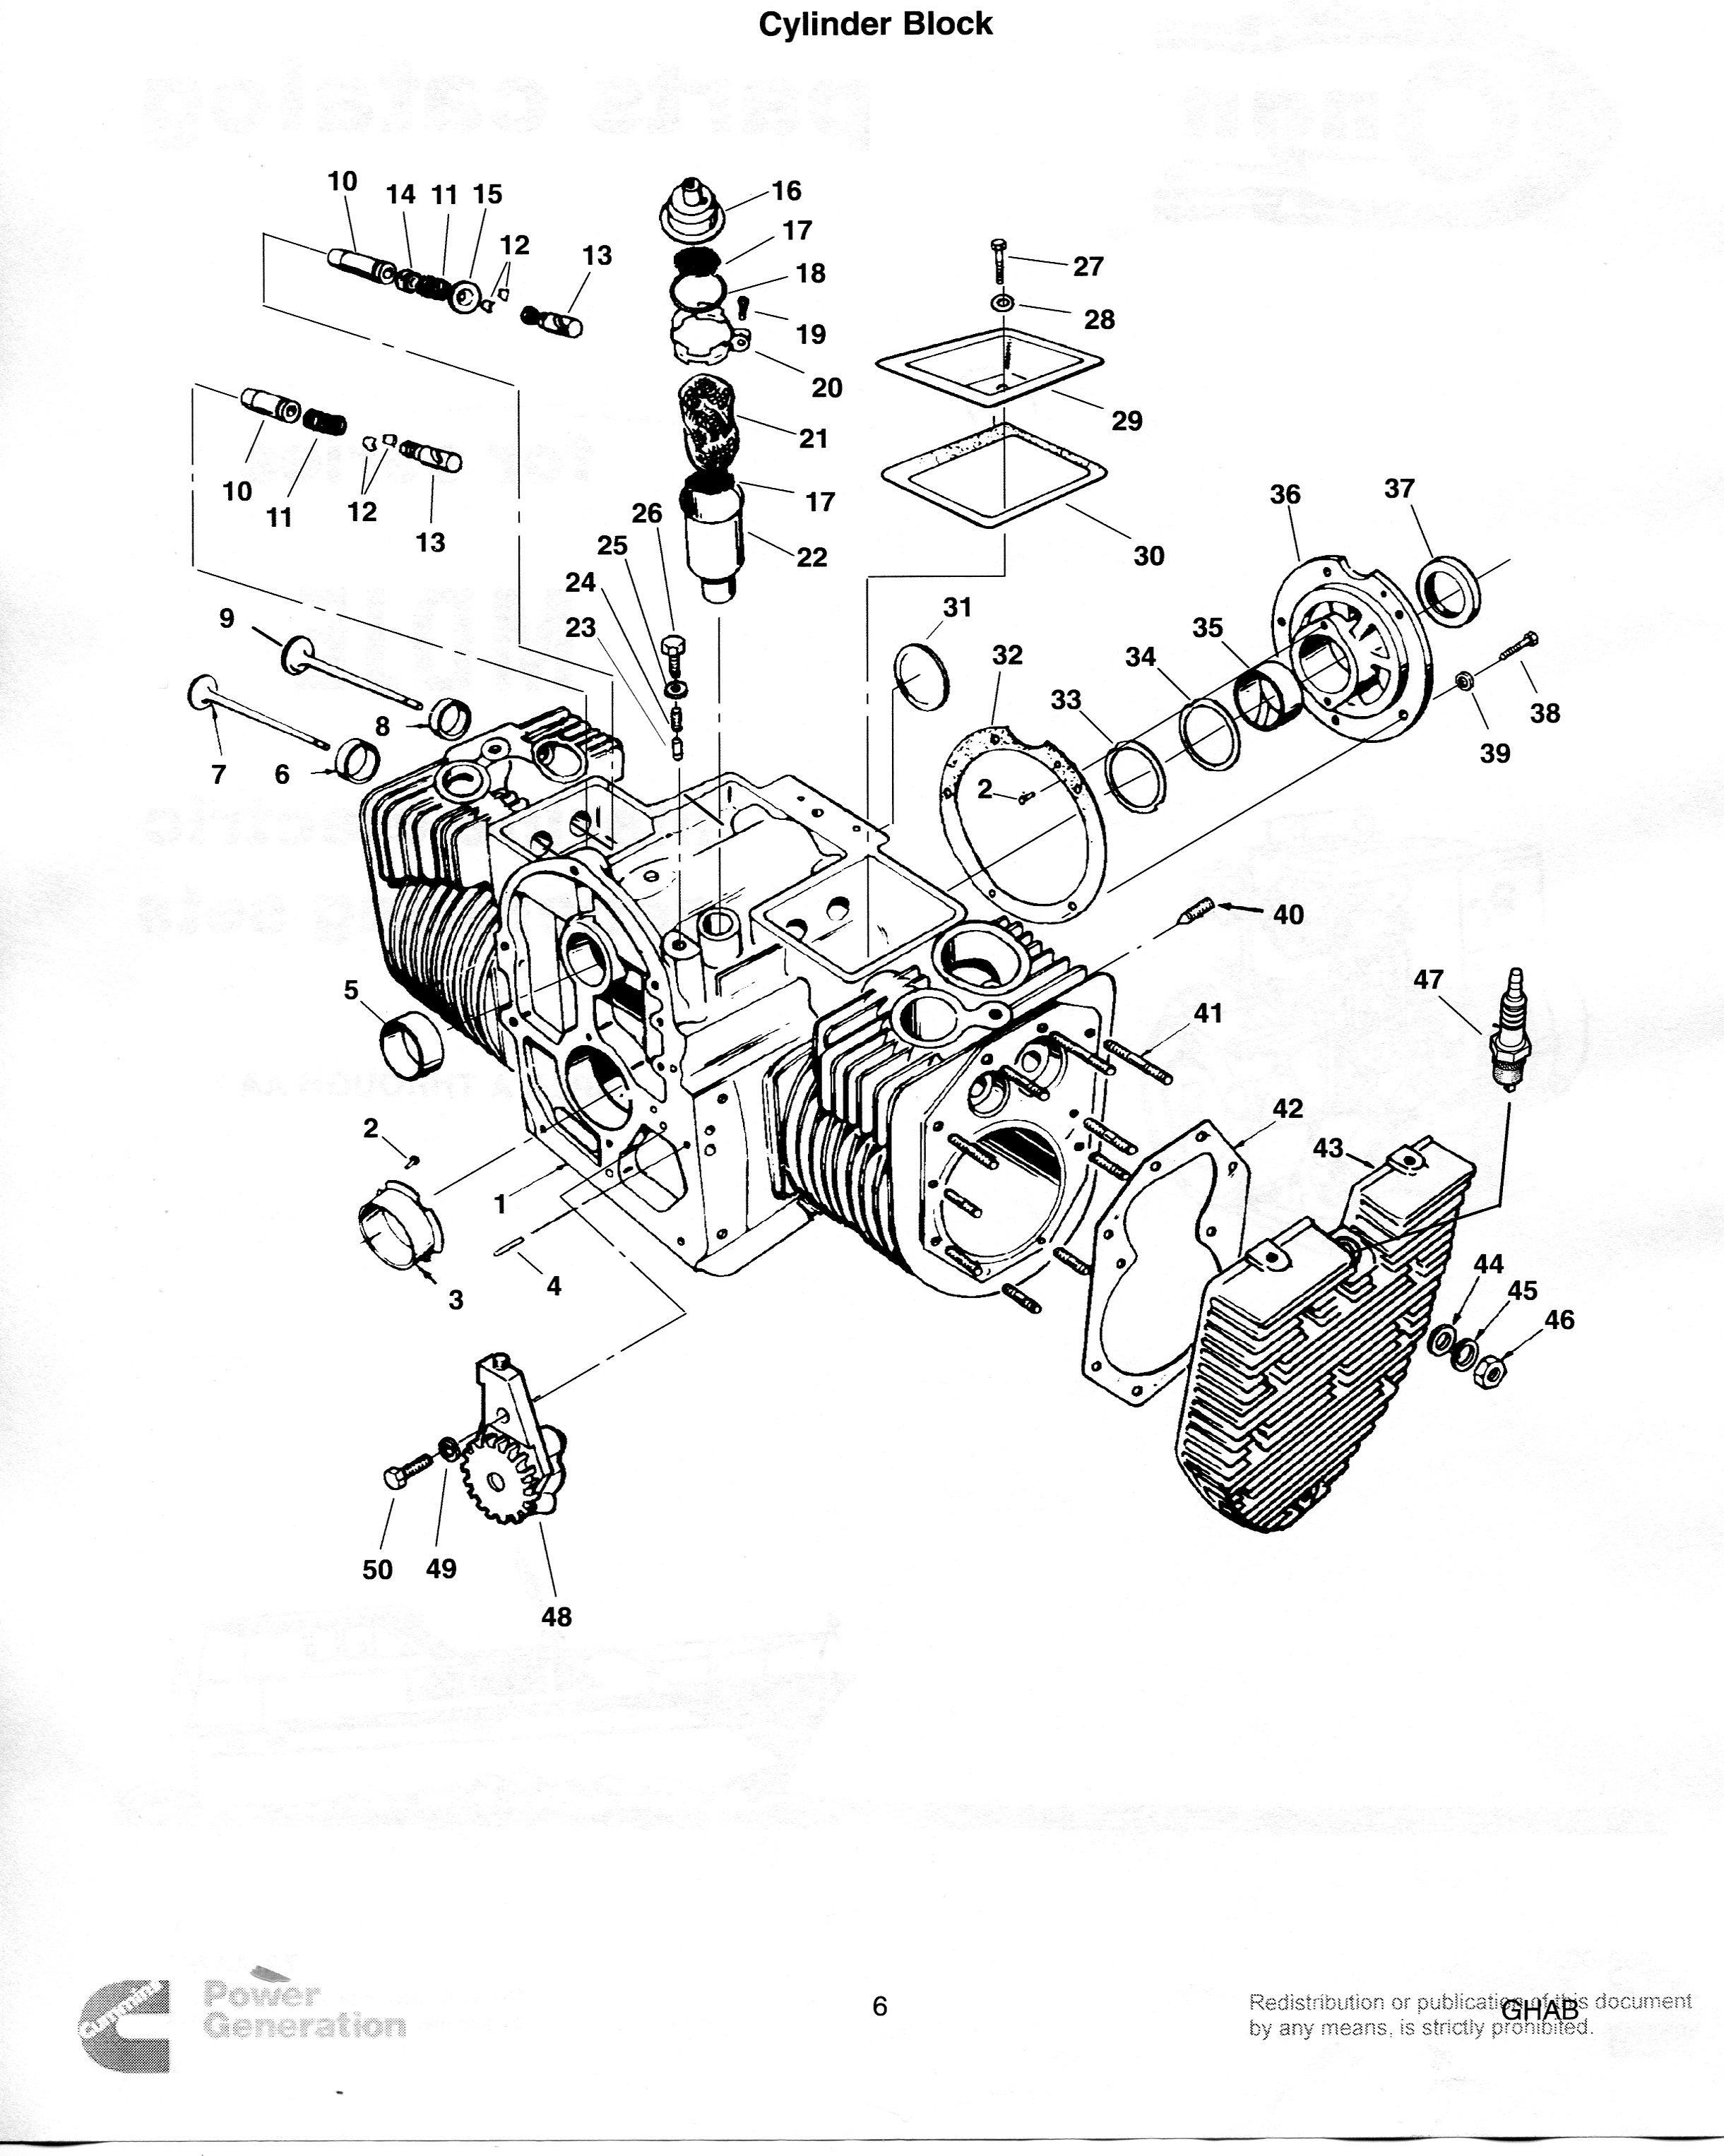 onan microquiet 4000 owners manual